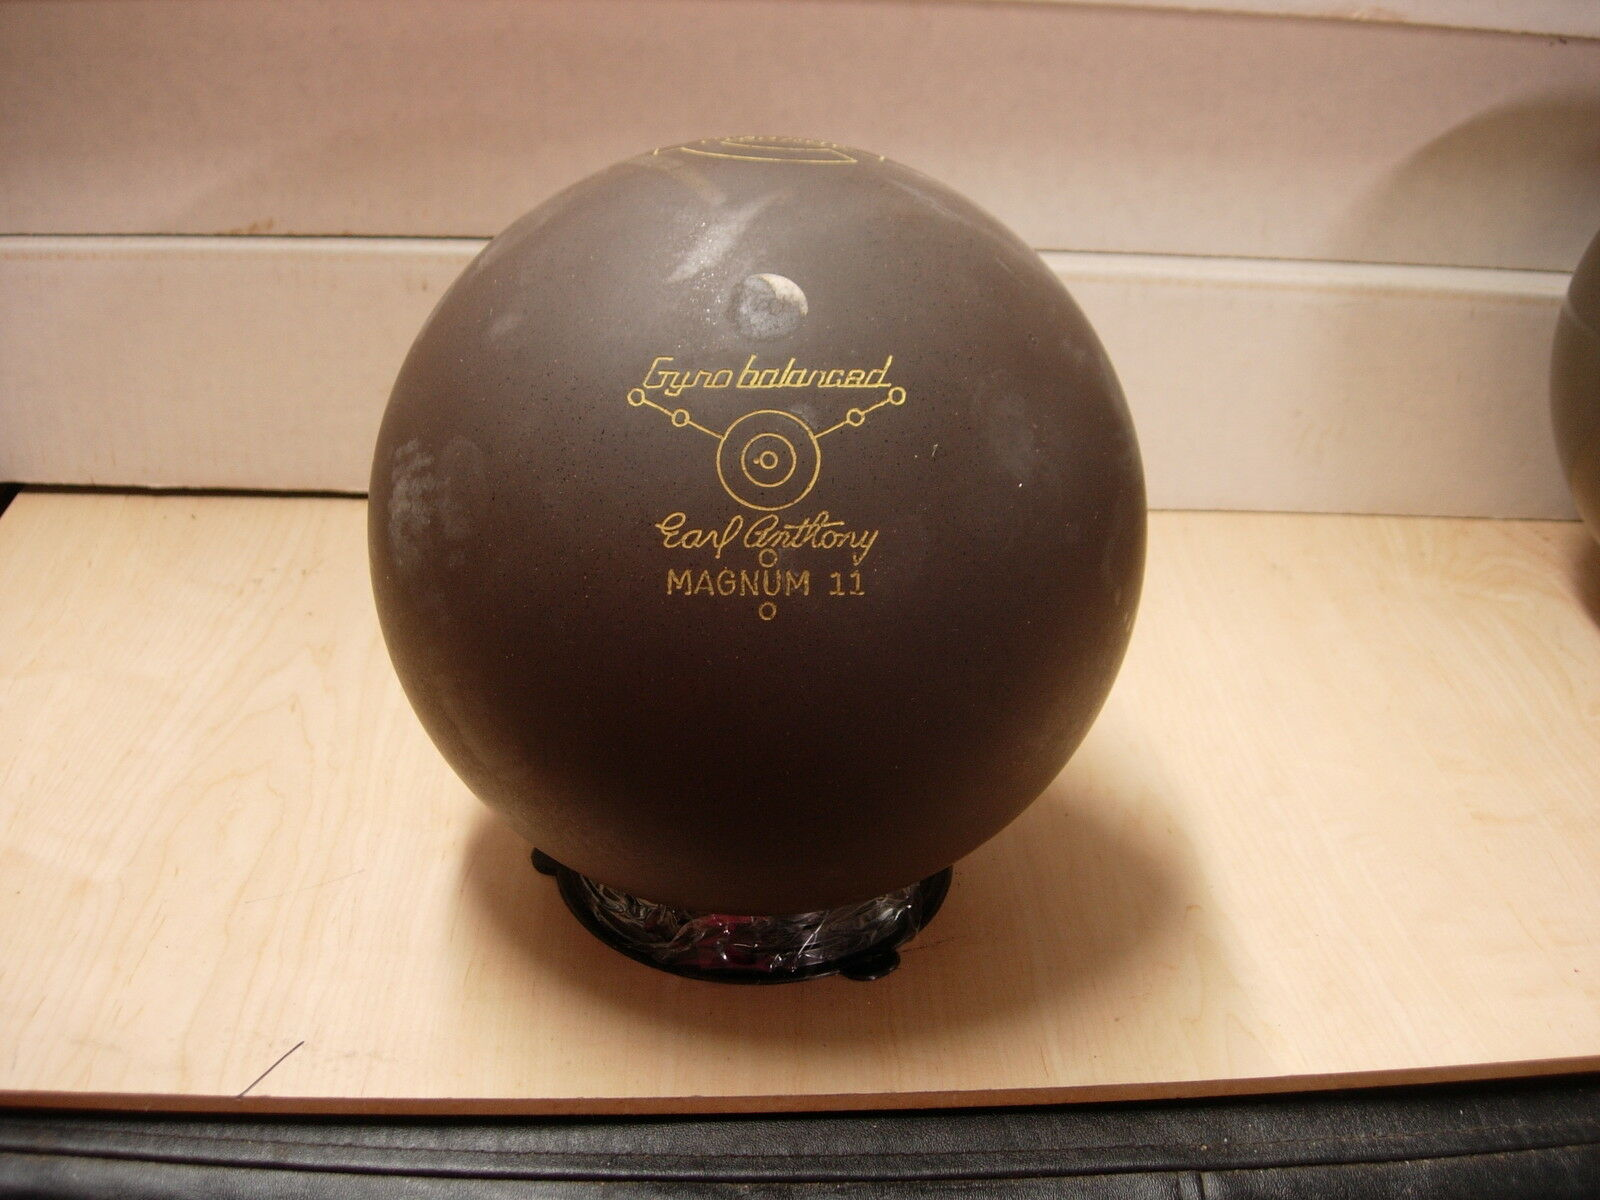 16 (15lb 15-1 2oz) TW 3-3 8 Ebonite 1982 MAGNUM 11 Bowling Ball Rubber Urethane